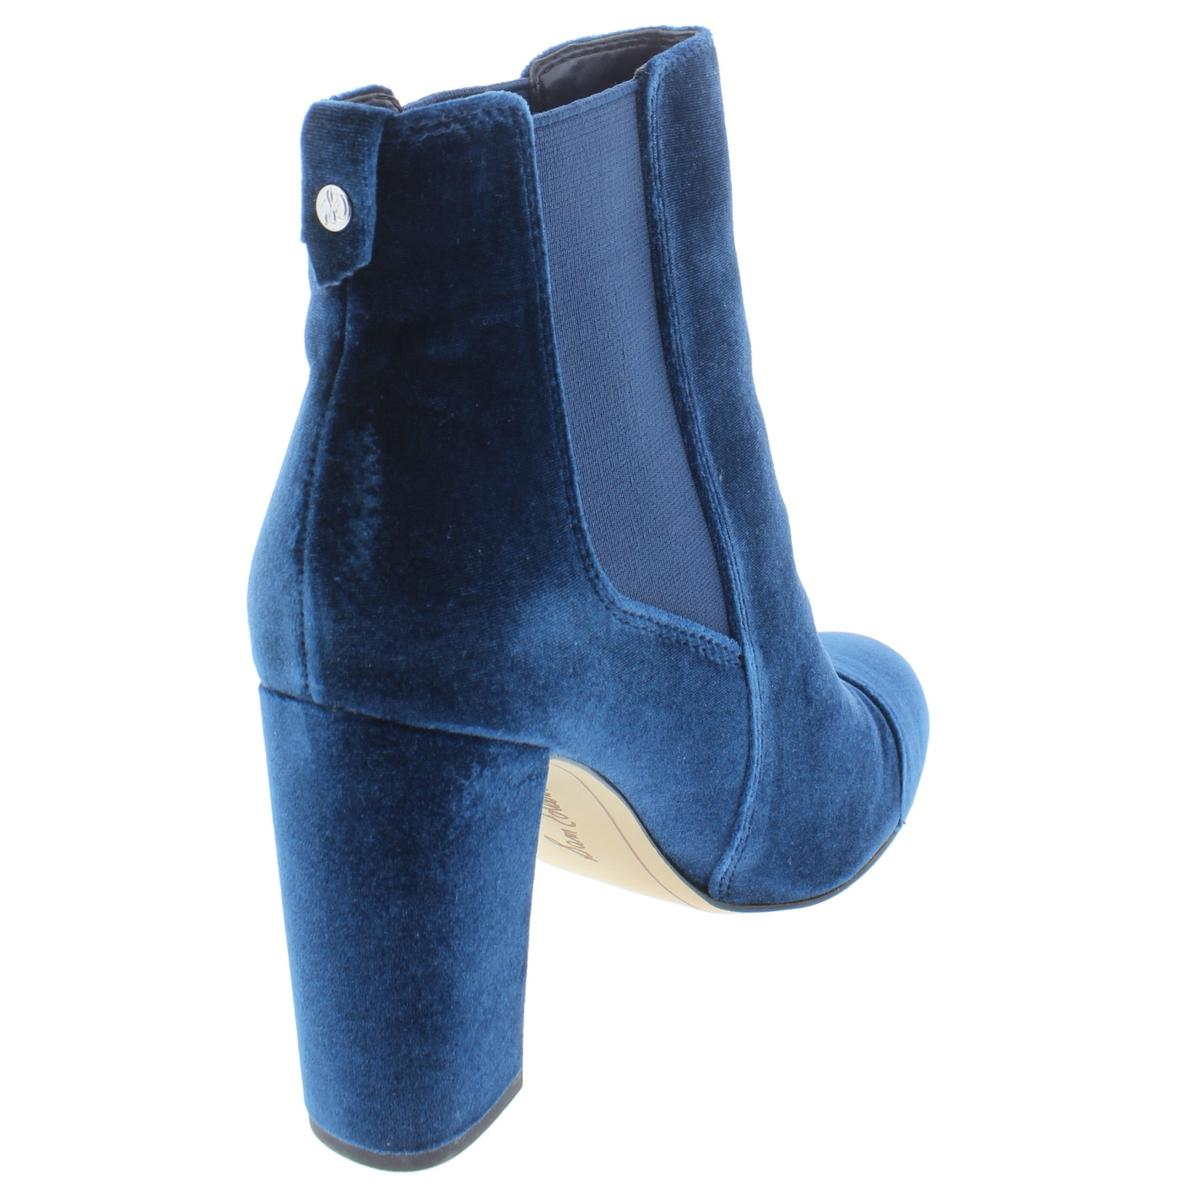 3f6d96b56e77 Sam Edelman Womens Case Blue Velvet BOOTIES Shoes 10 Medium (b M ...